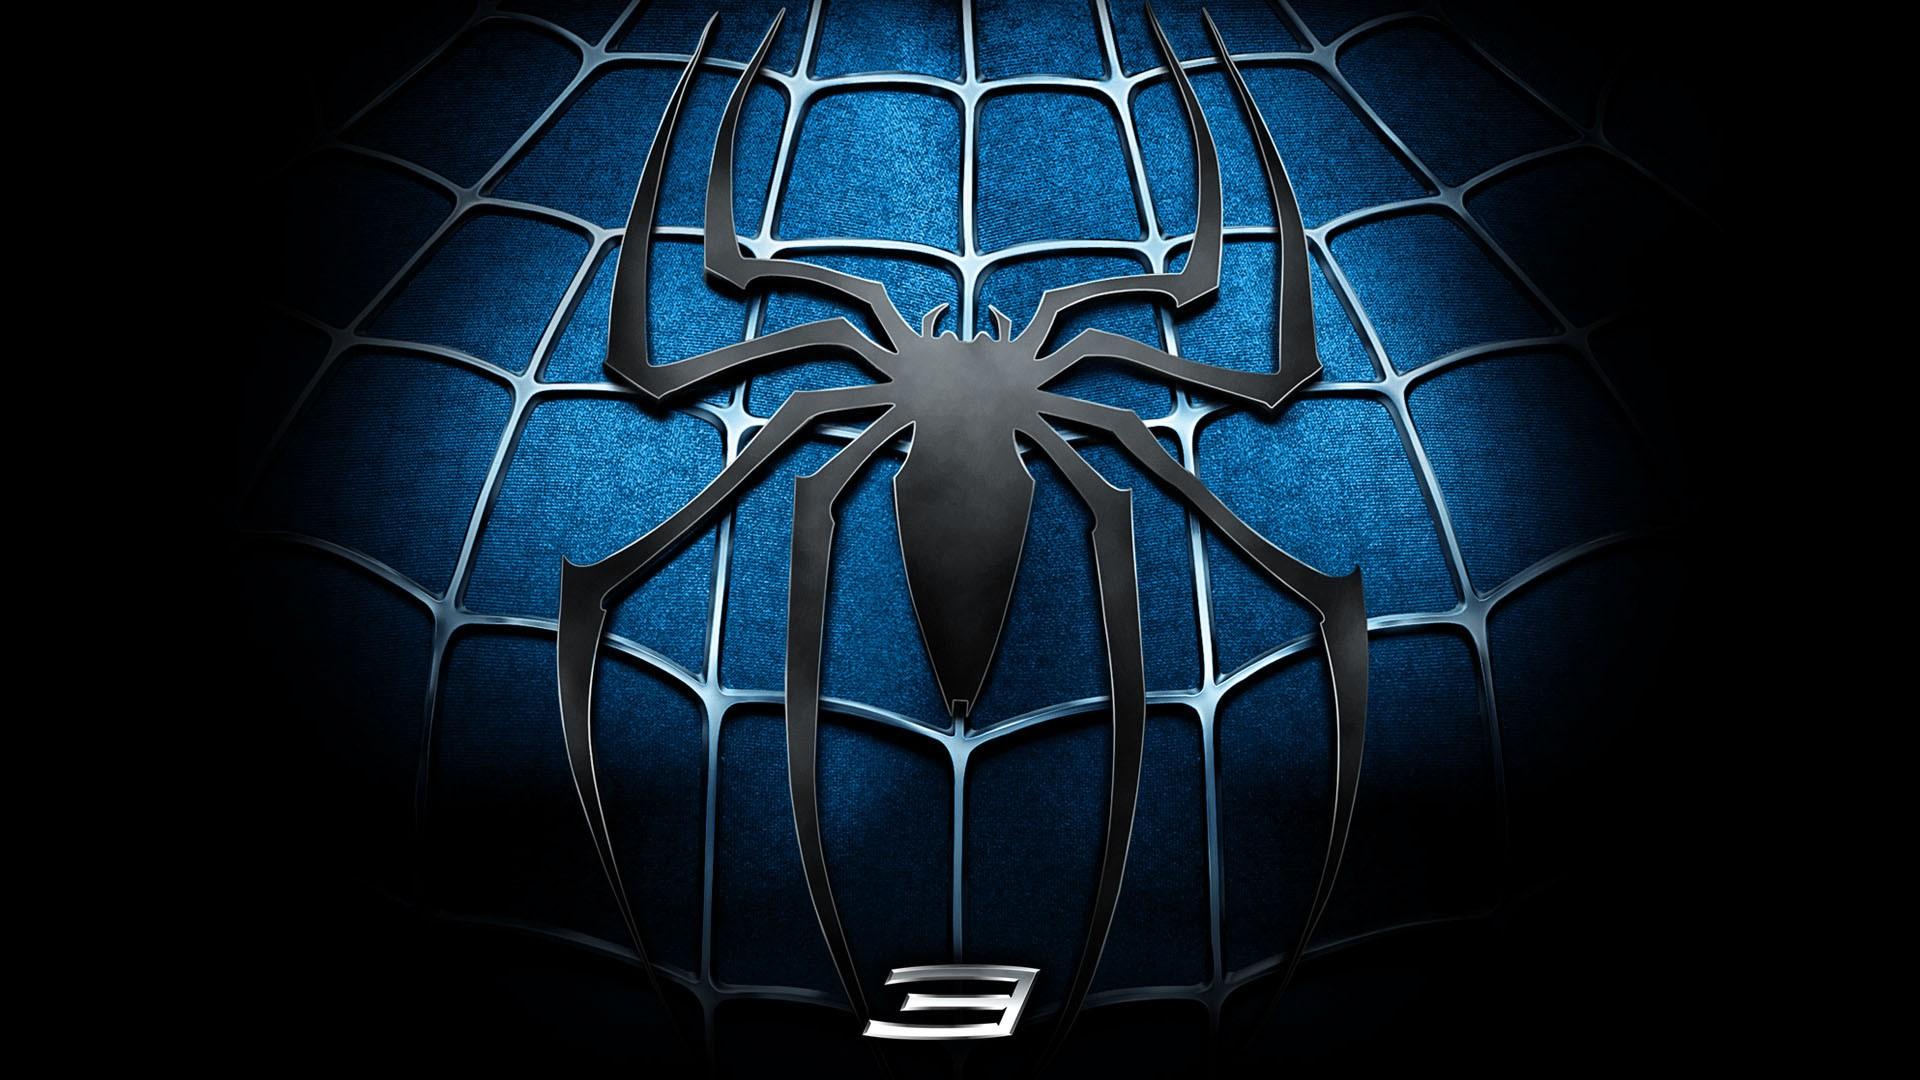 Spider Man 3 Hd Wallpaper Background Image 1920x1080 Id374464